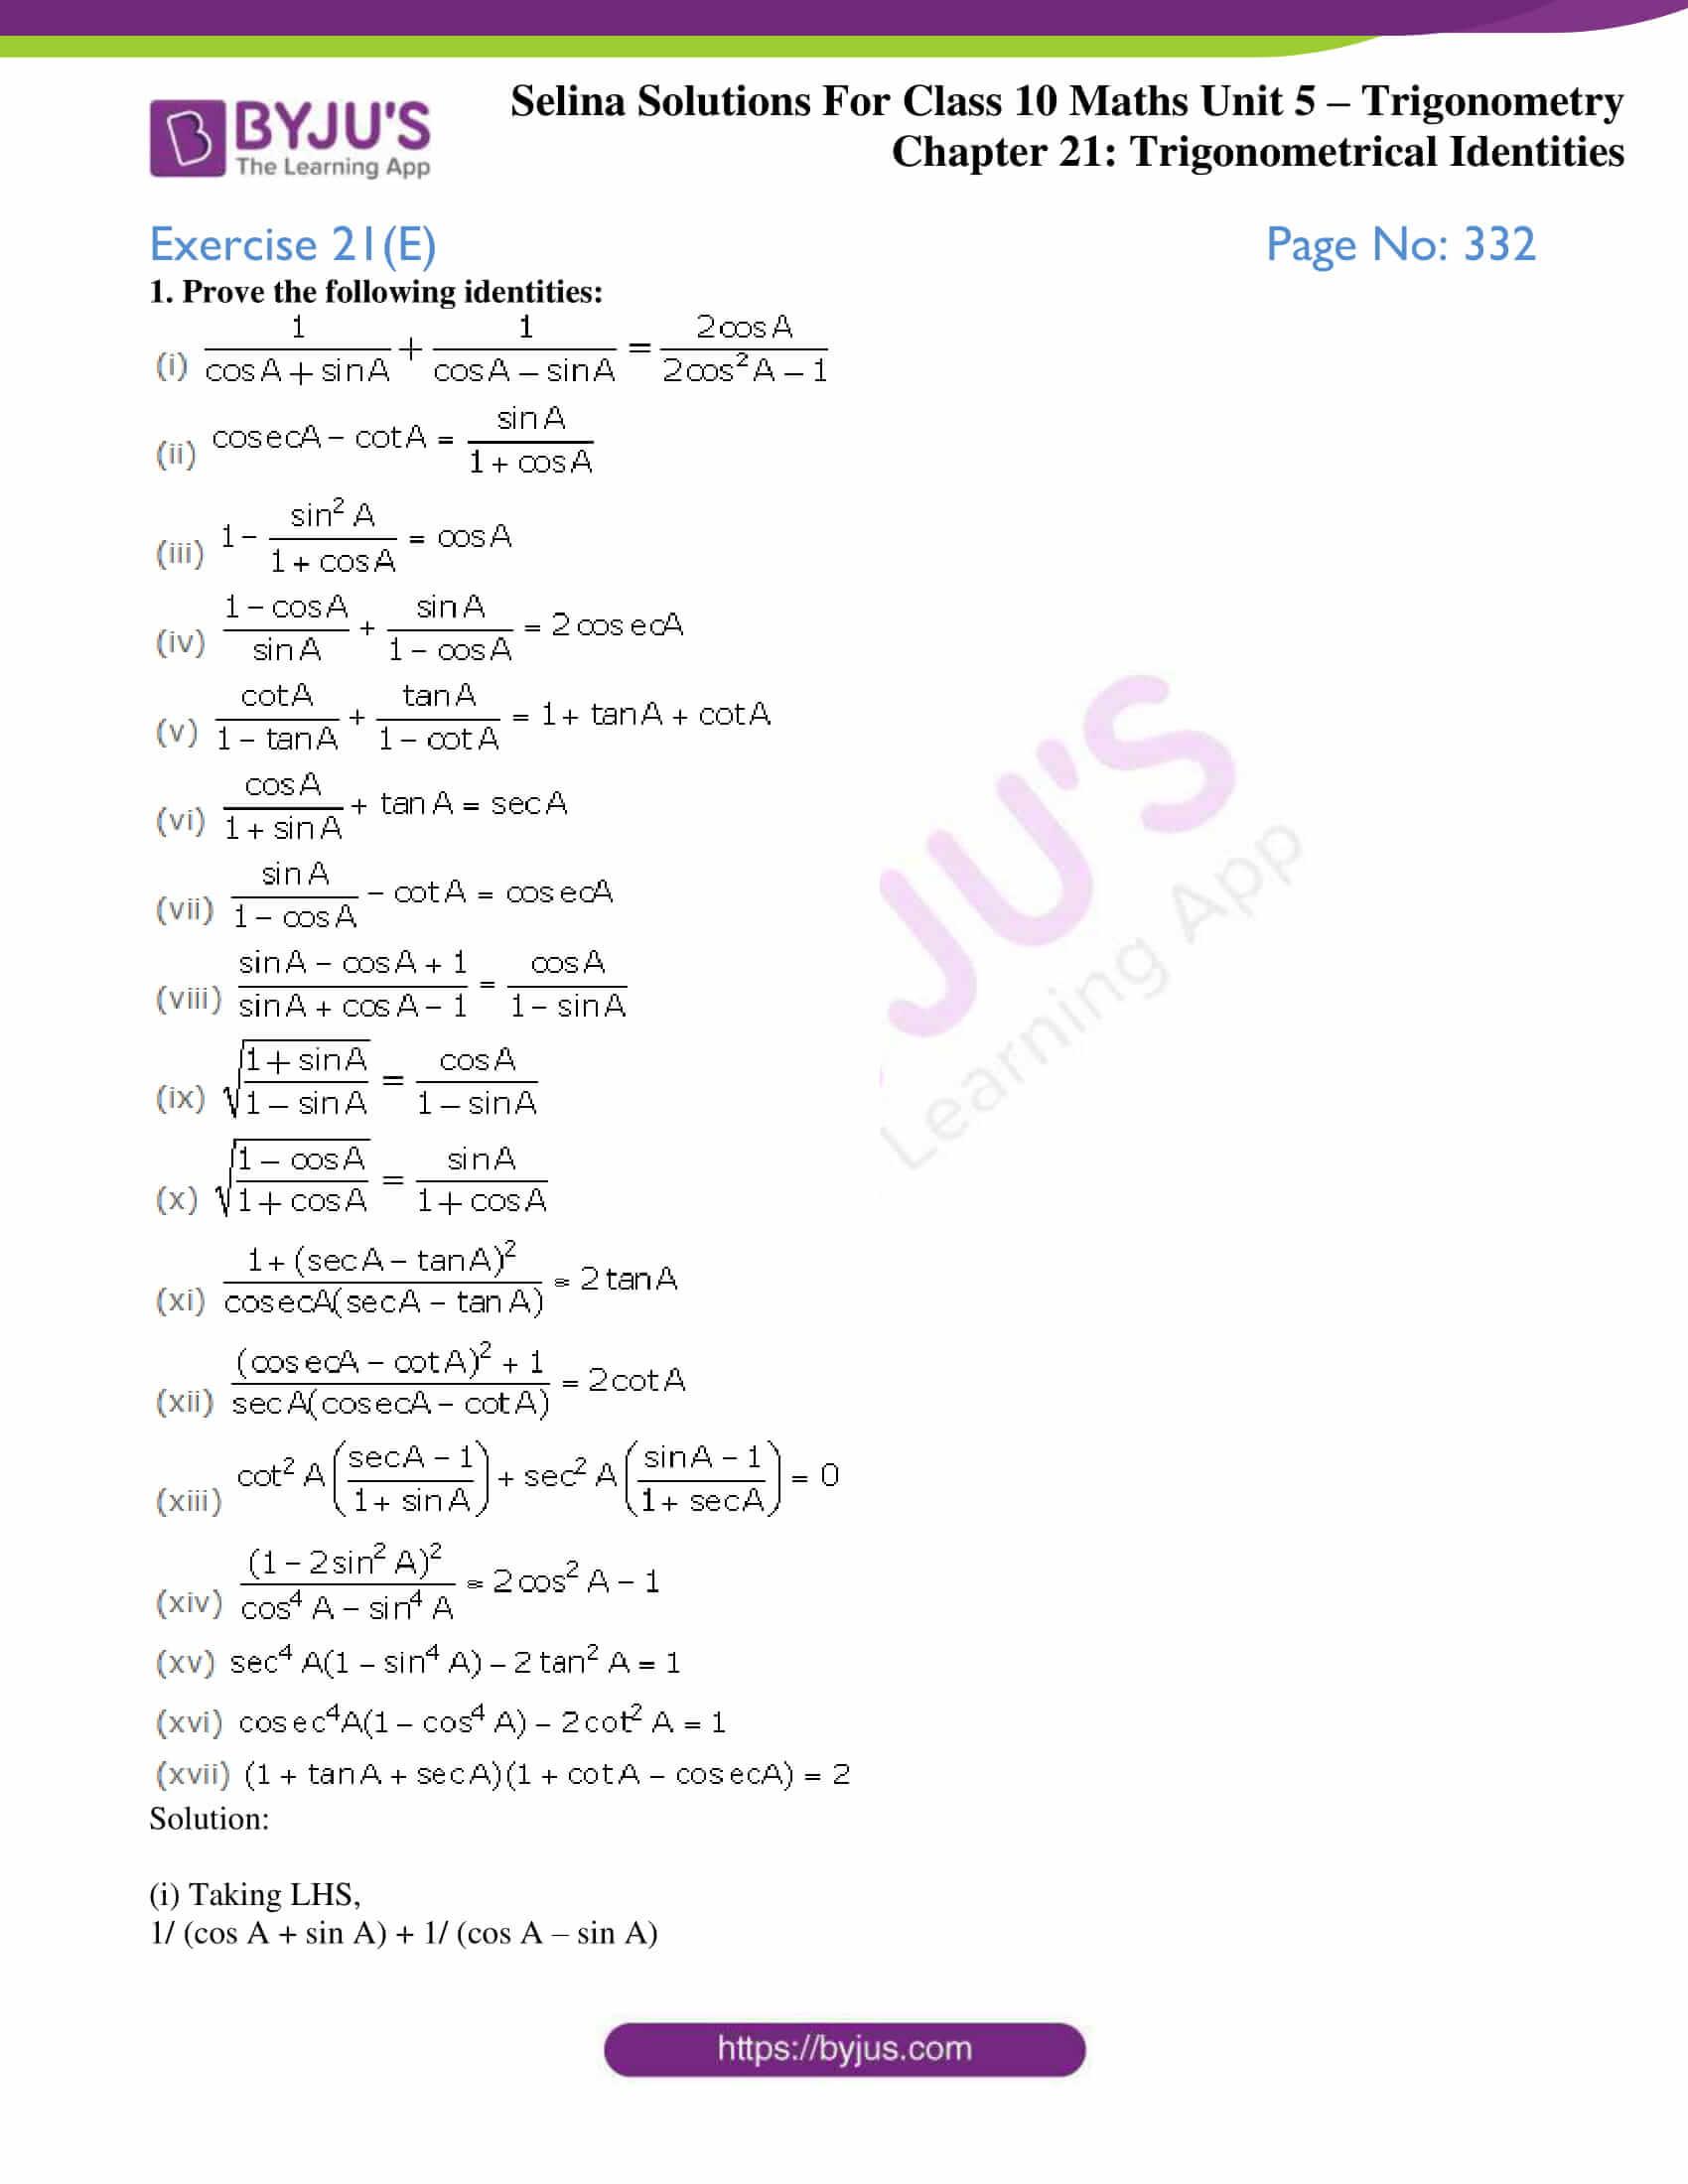 selina-sol-maths-class-10-ch-21-ex-e-01